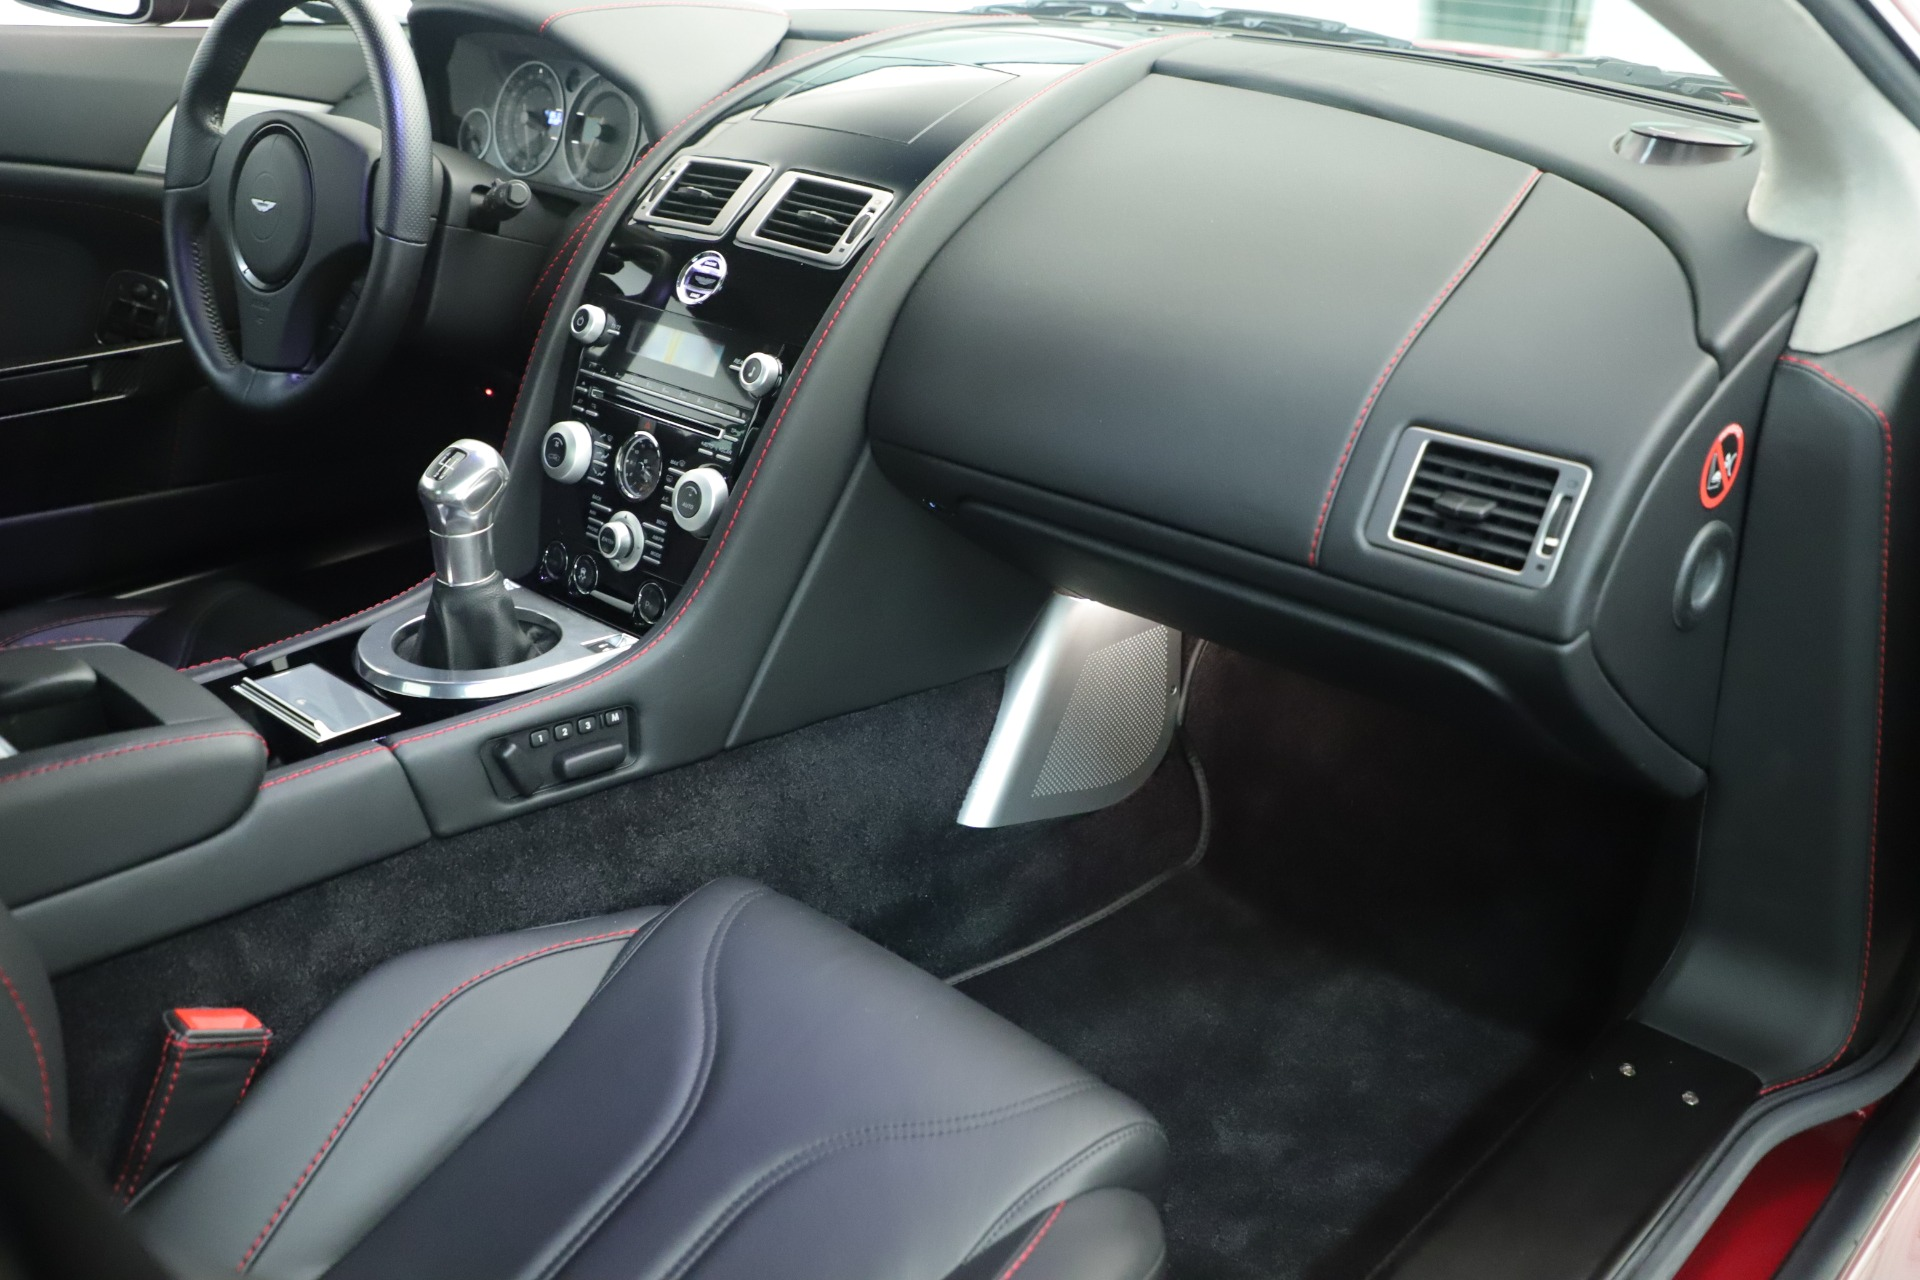 Used 2011 Aston Martin V12 Vantage Coupe